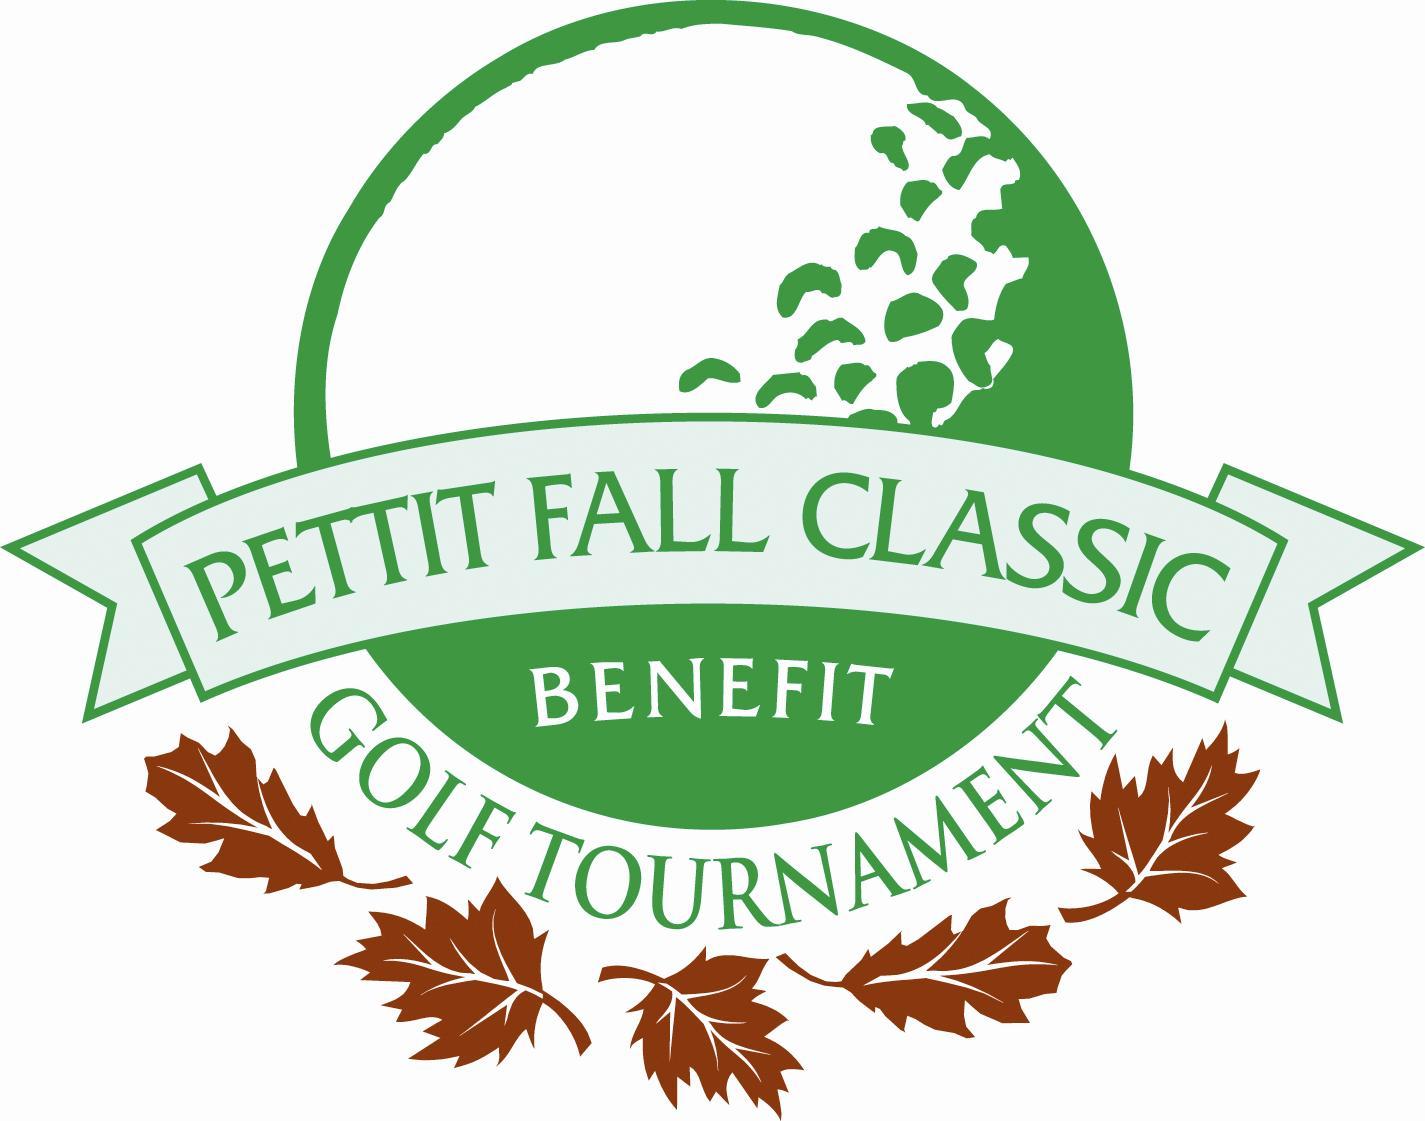 ... Announces 14th Annual Pettit Fall Classic Benefit Golf Tournament